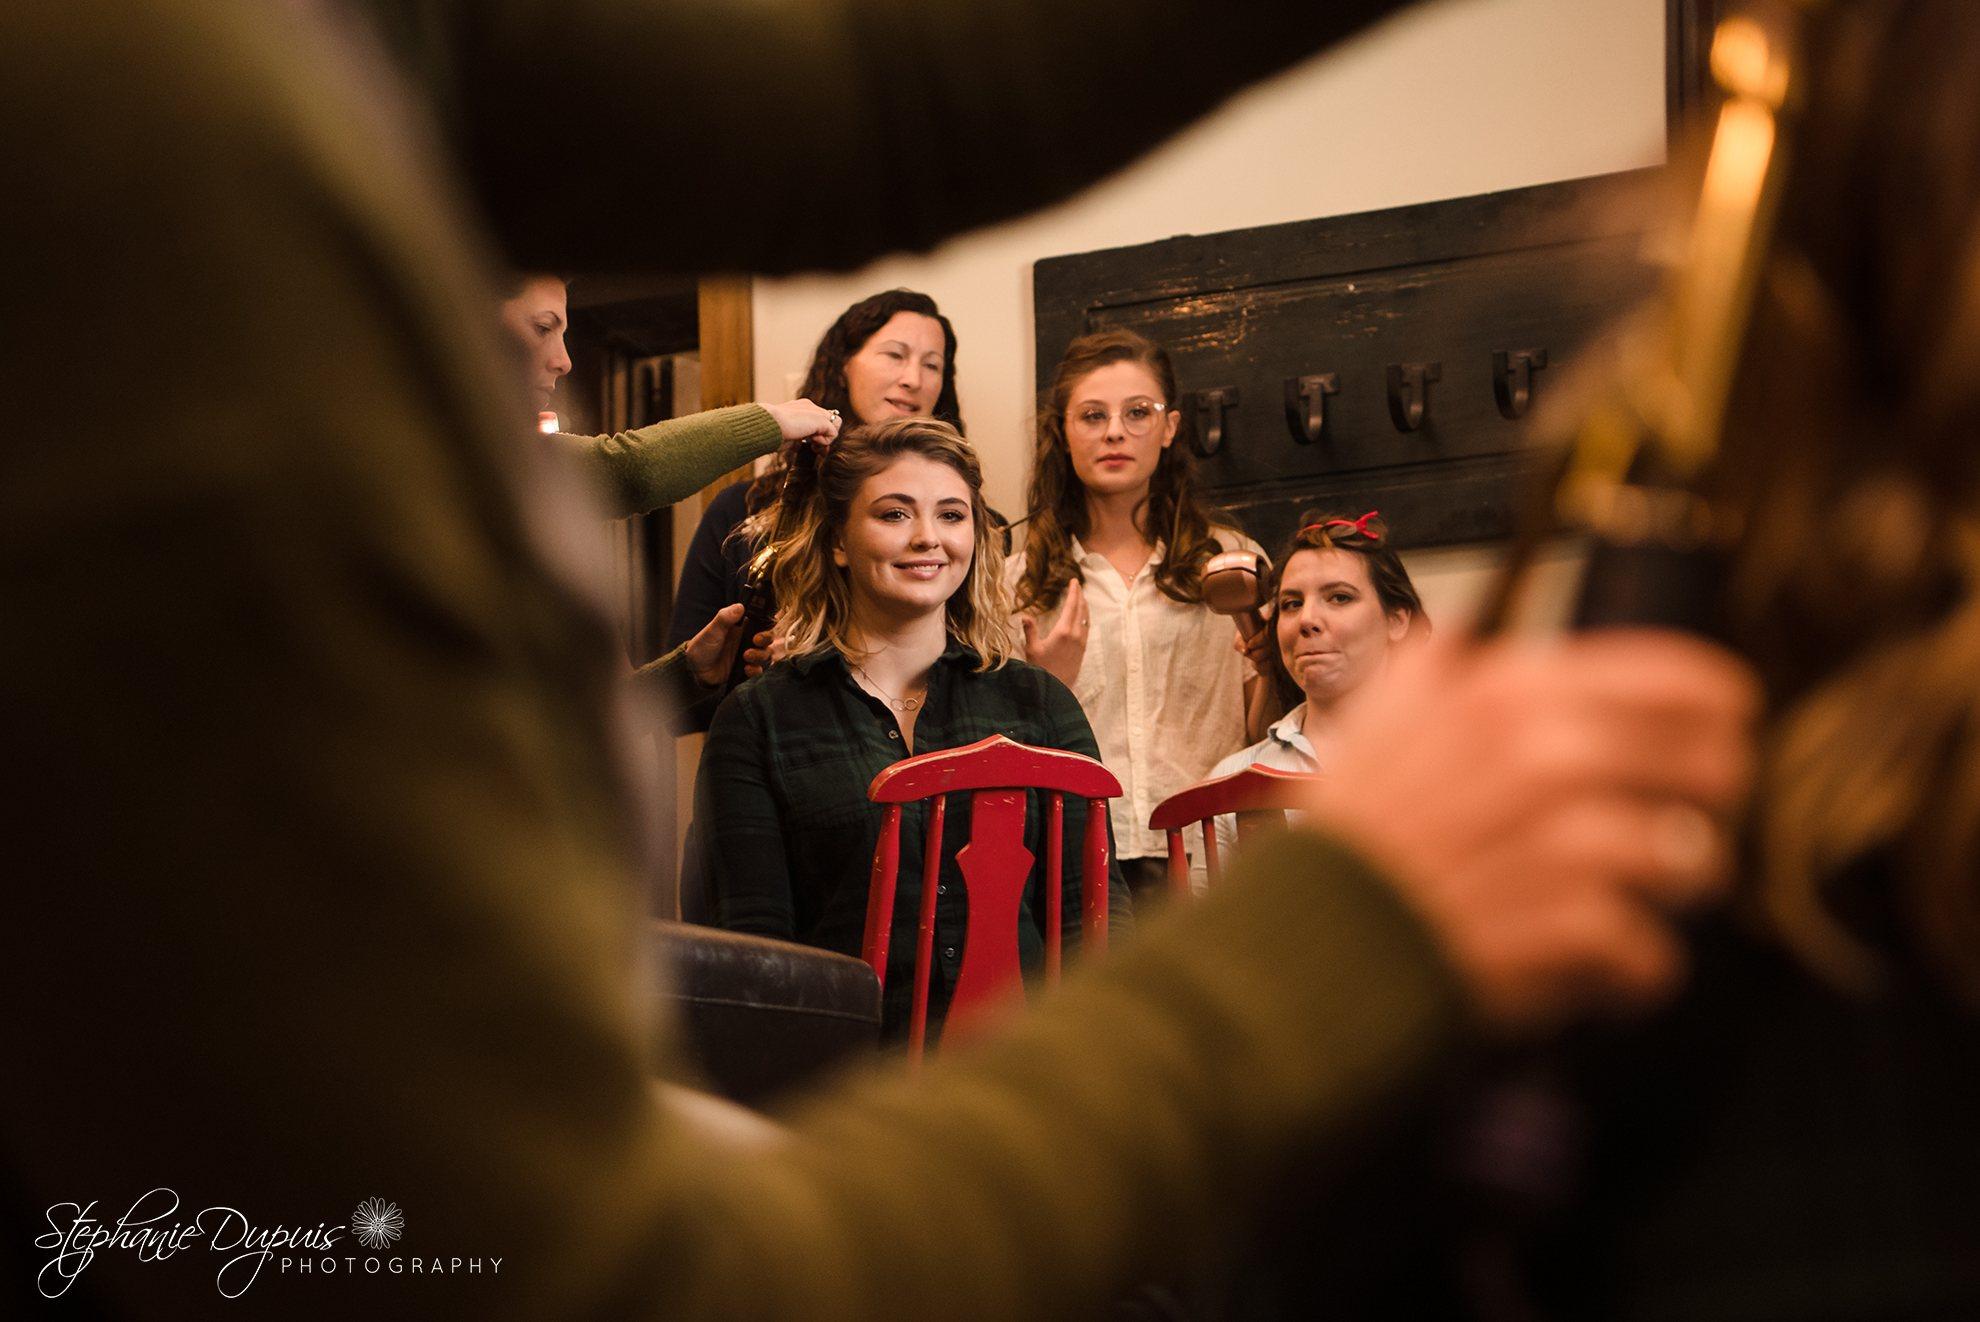 Berlin Wedding Photographer 02 3 - Portfolio: Kittle Wedding